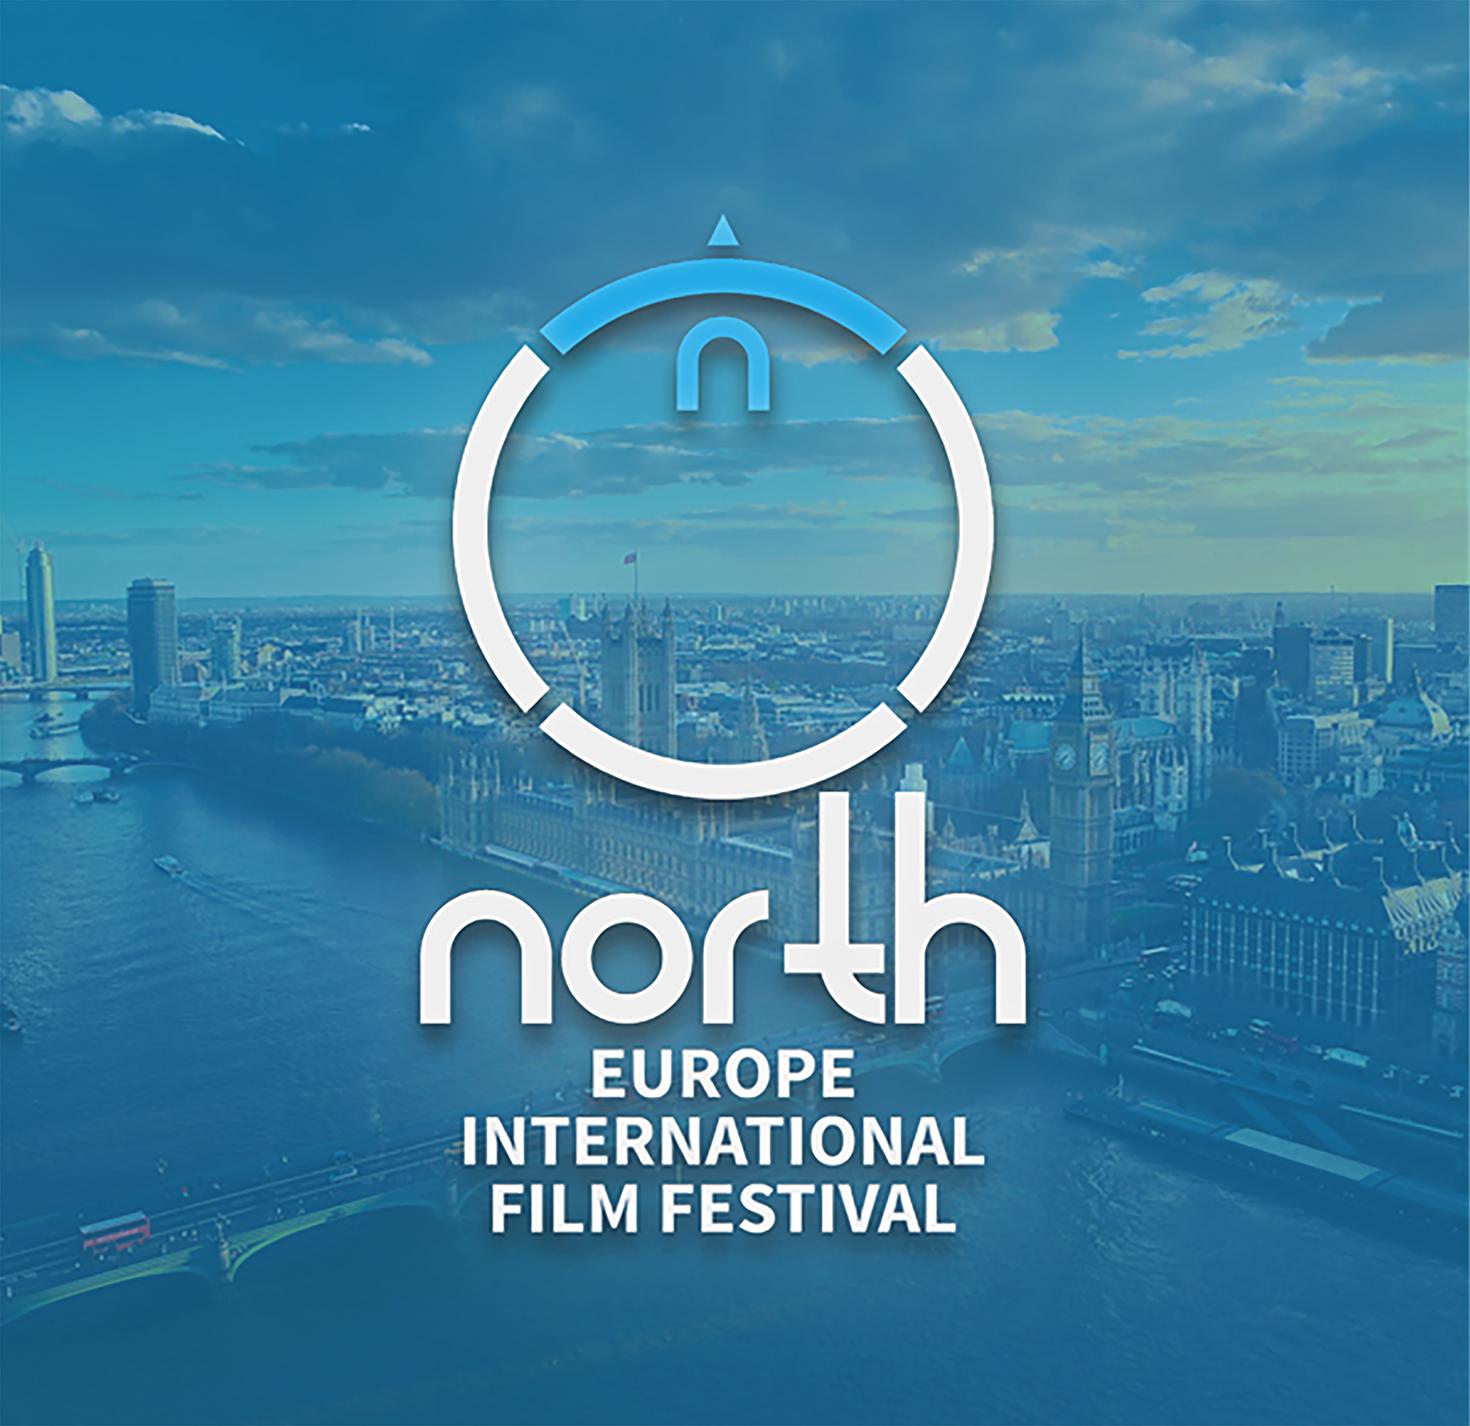 North Europe International Film Festival.png